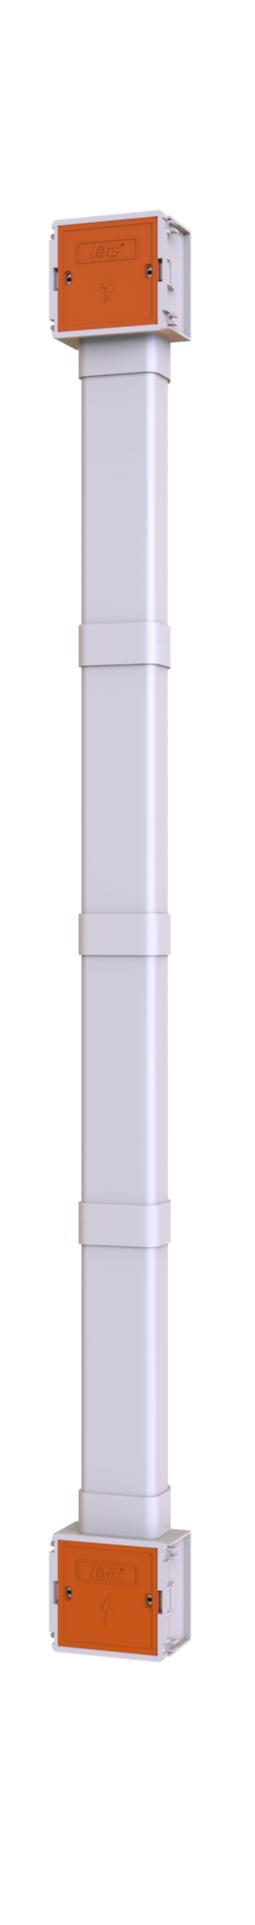 PVC 弱电屏蔽/简易理线器